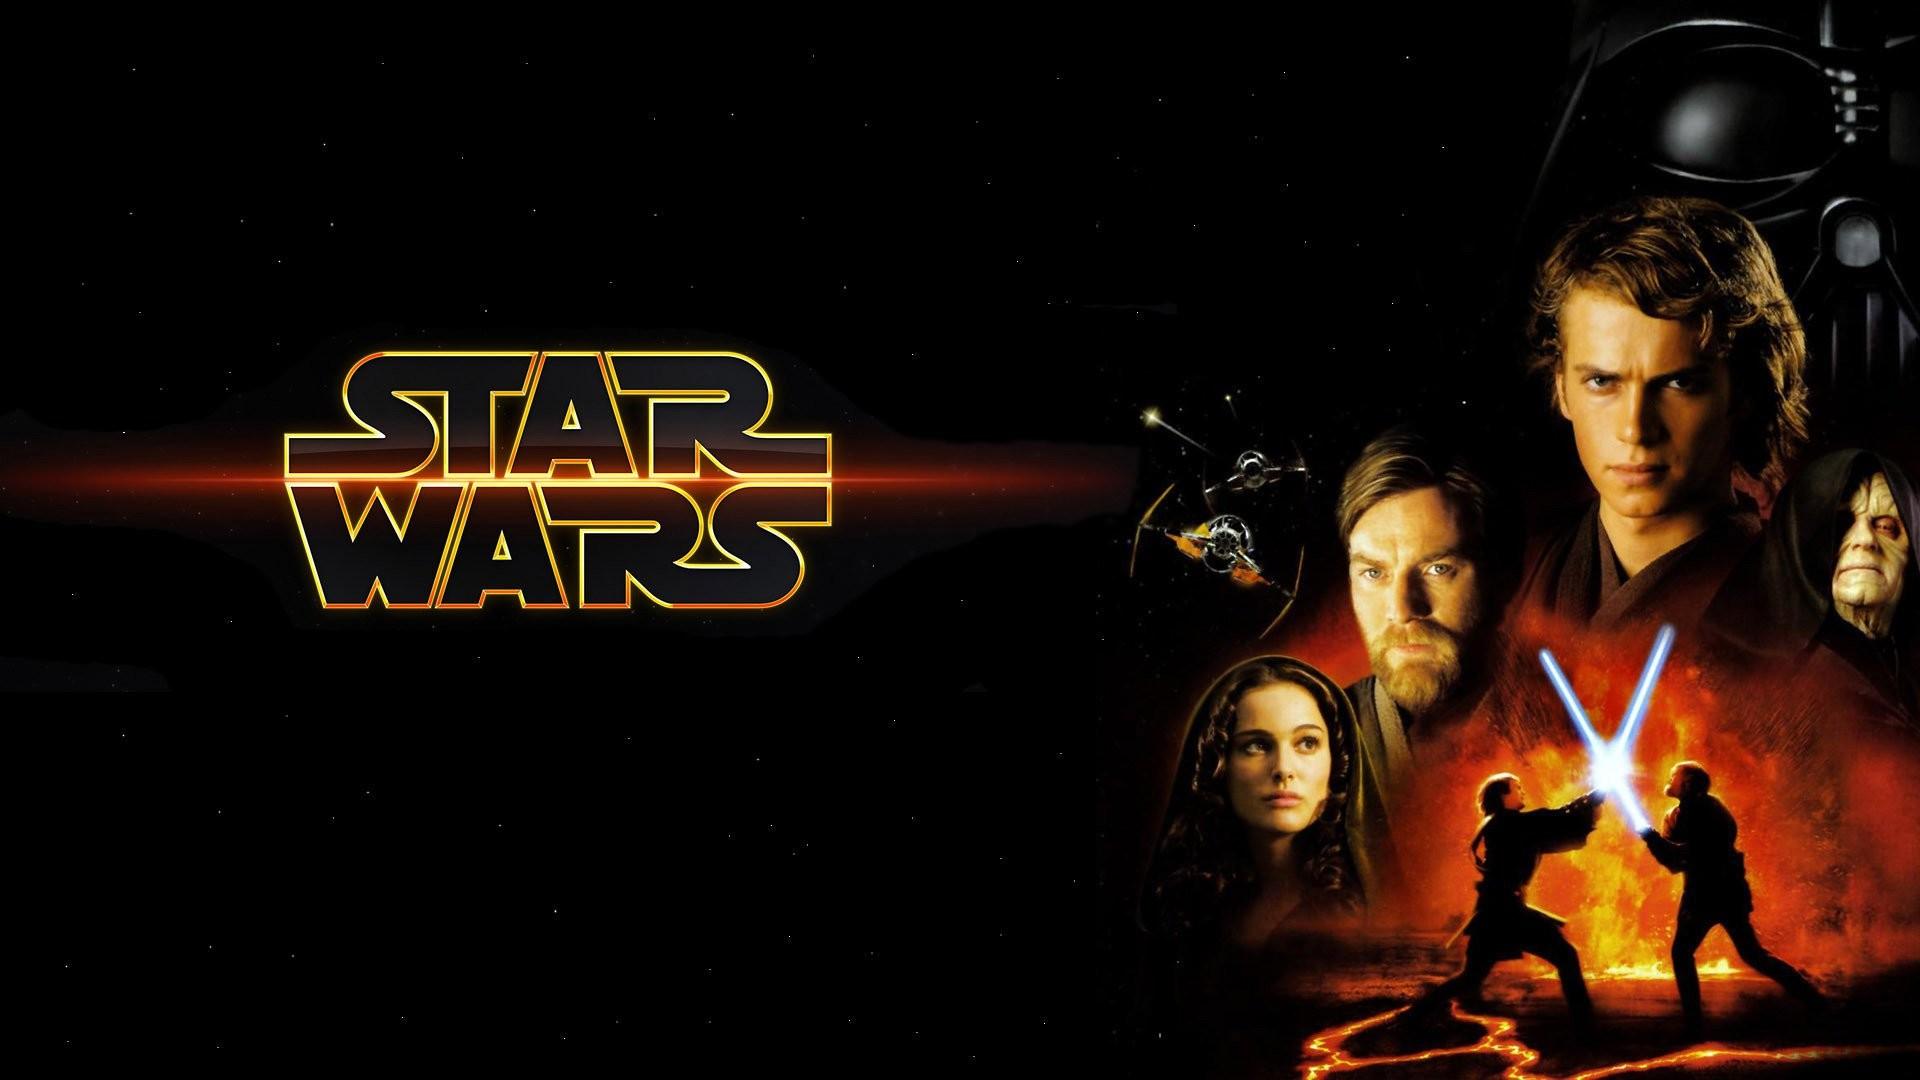 Star Wars: Episode III – Revenge of the Sith – wallpaper